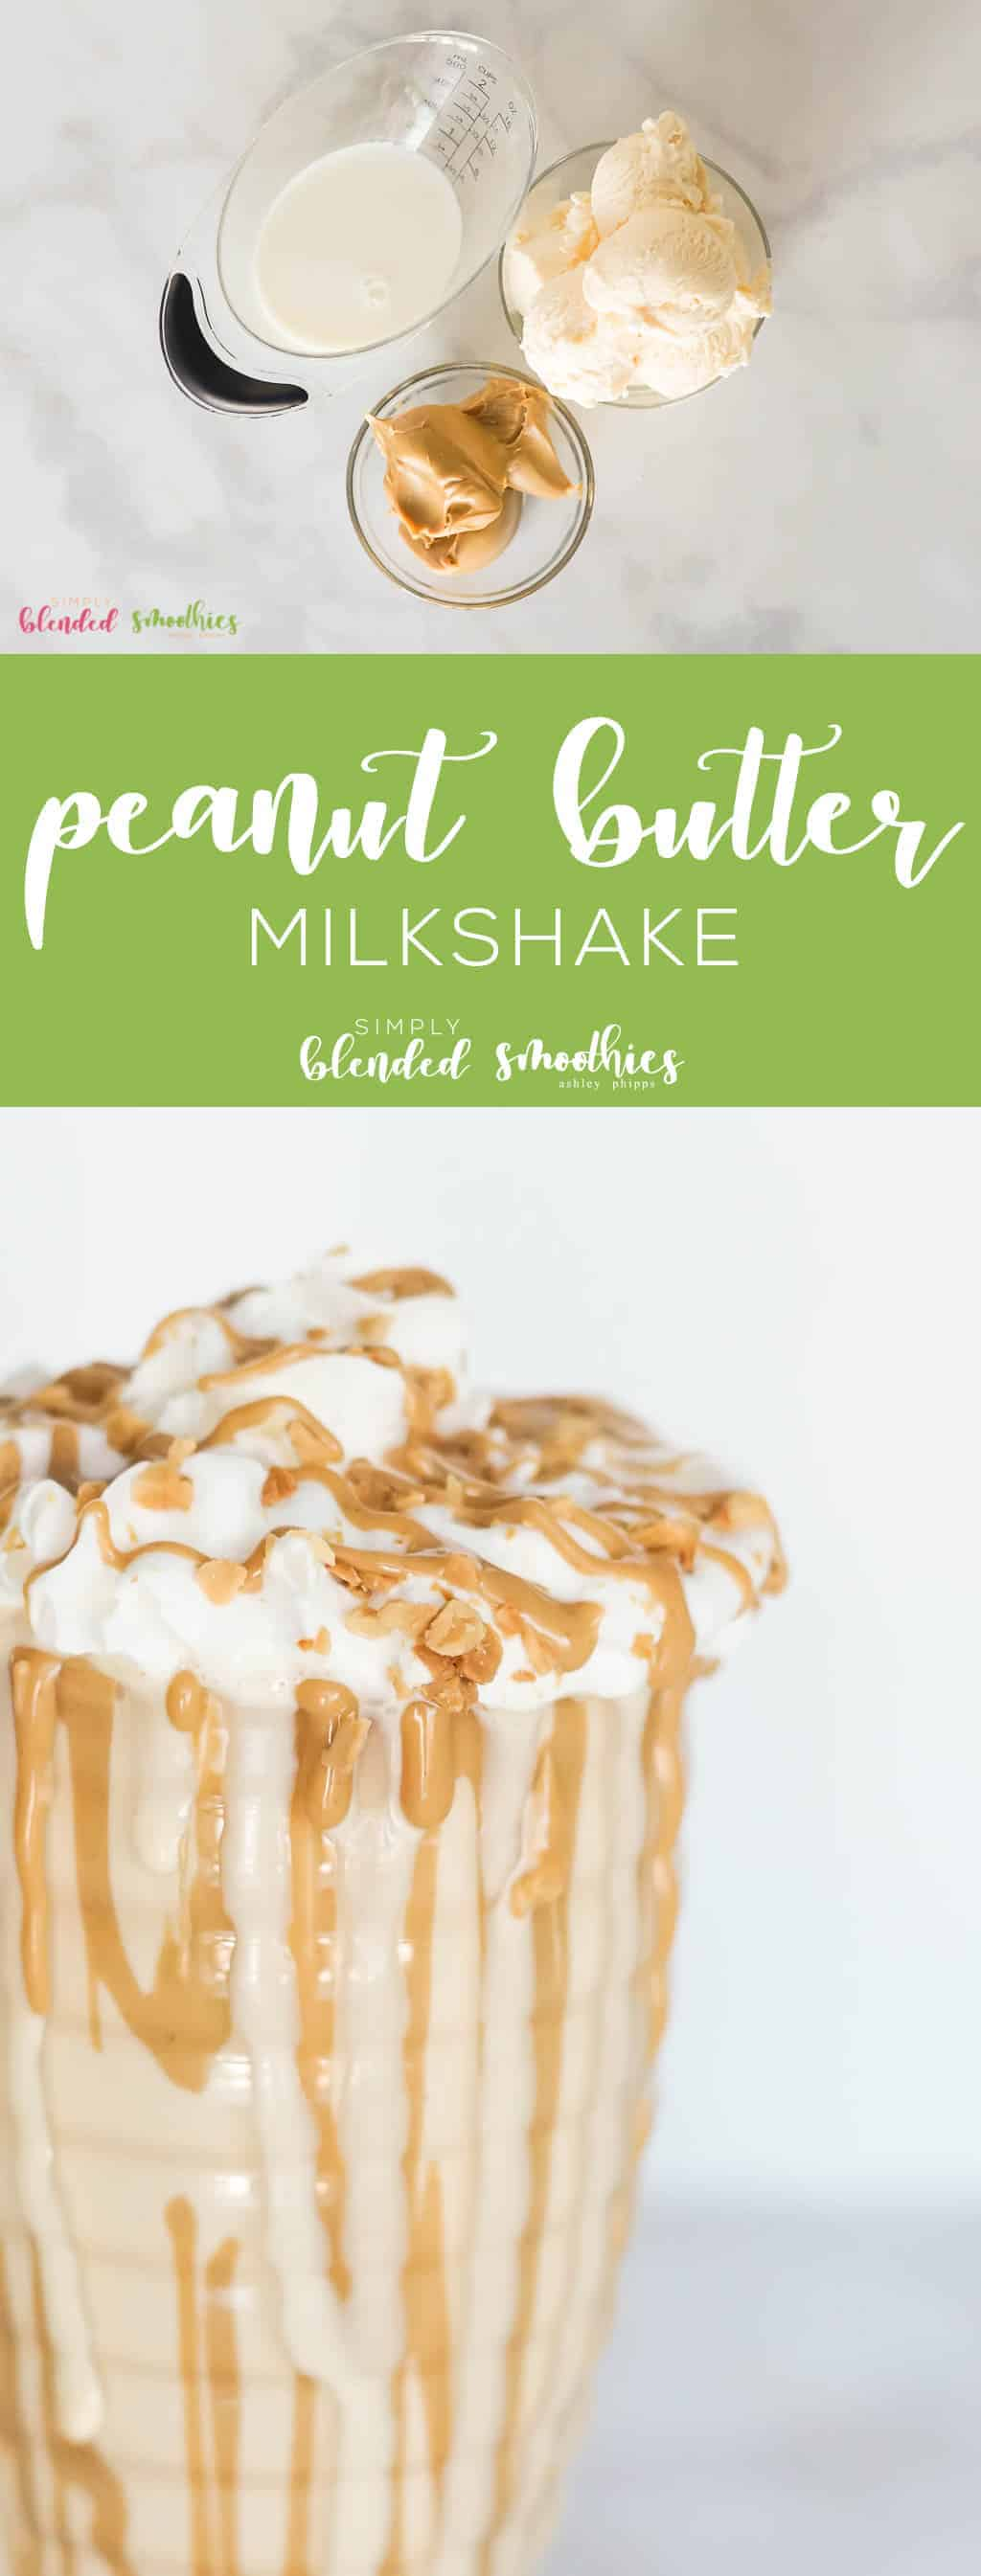 Peanut Butter Milkshake - this delicious 3 ingredient peanut butter milkshake is easy to make and the perfect treat